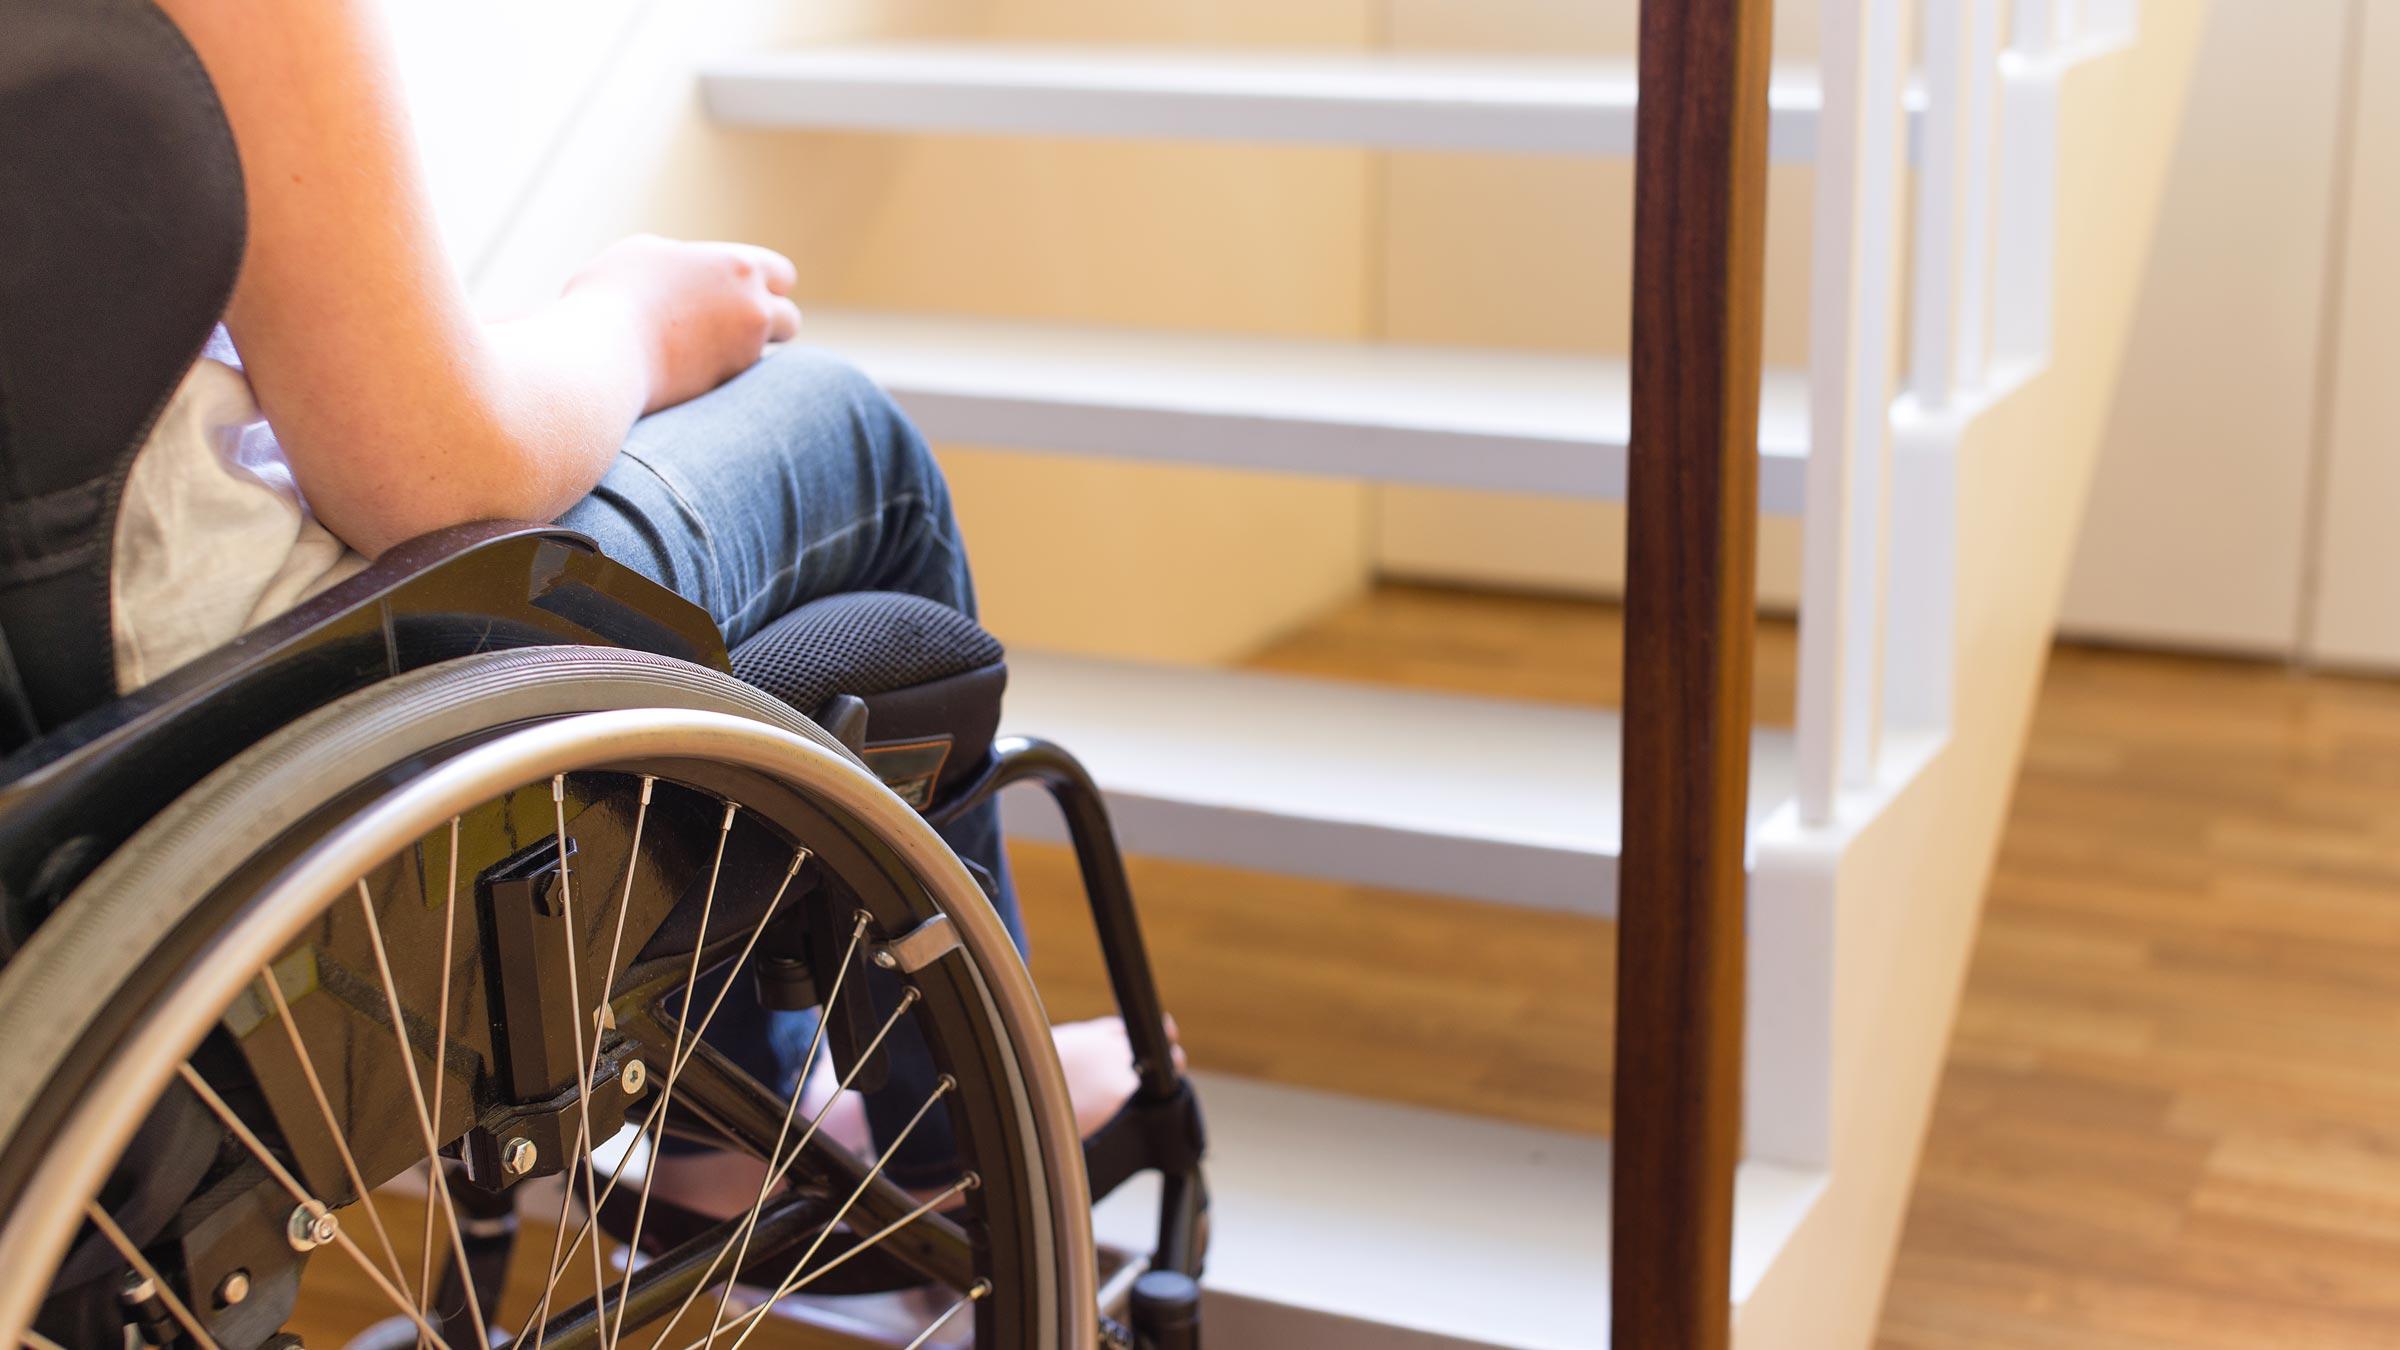 Problemi di accessibilità in una casa a due piani